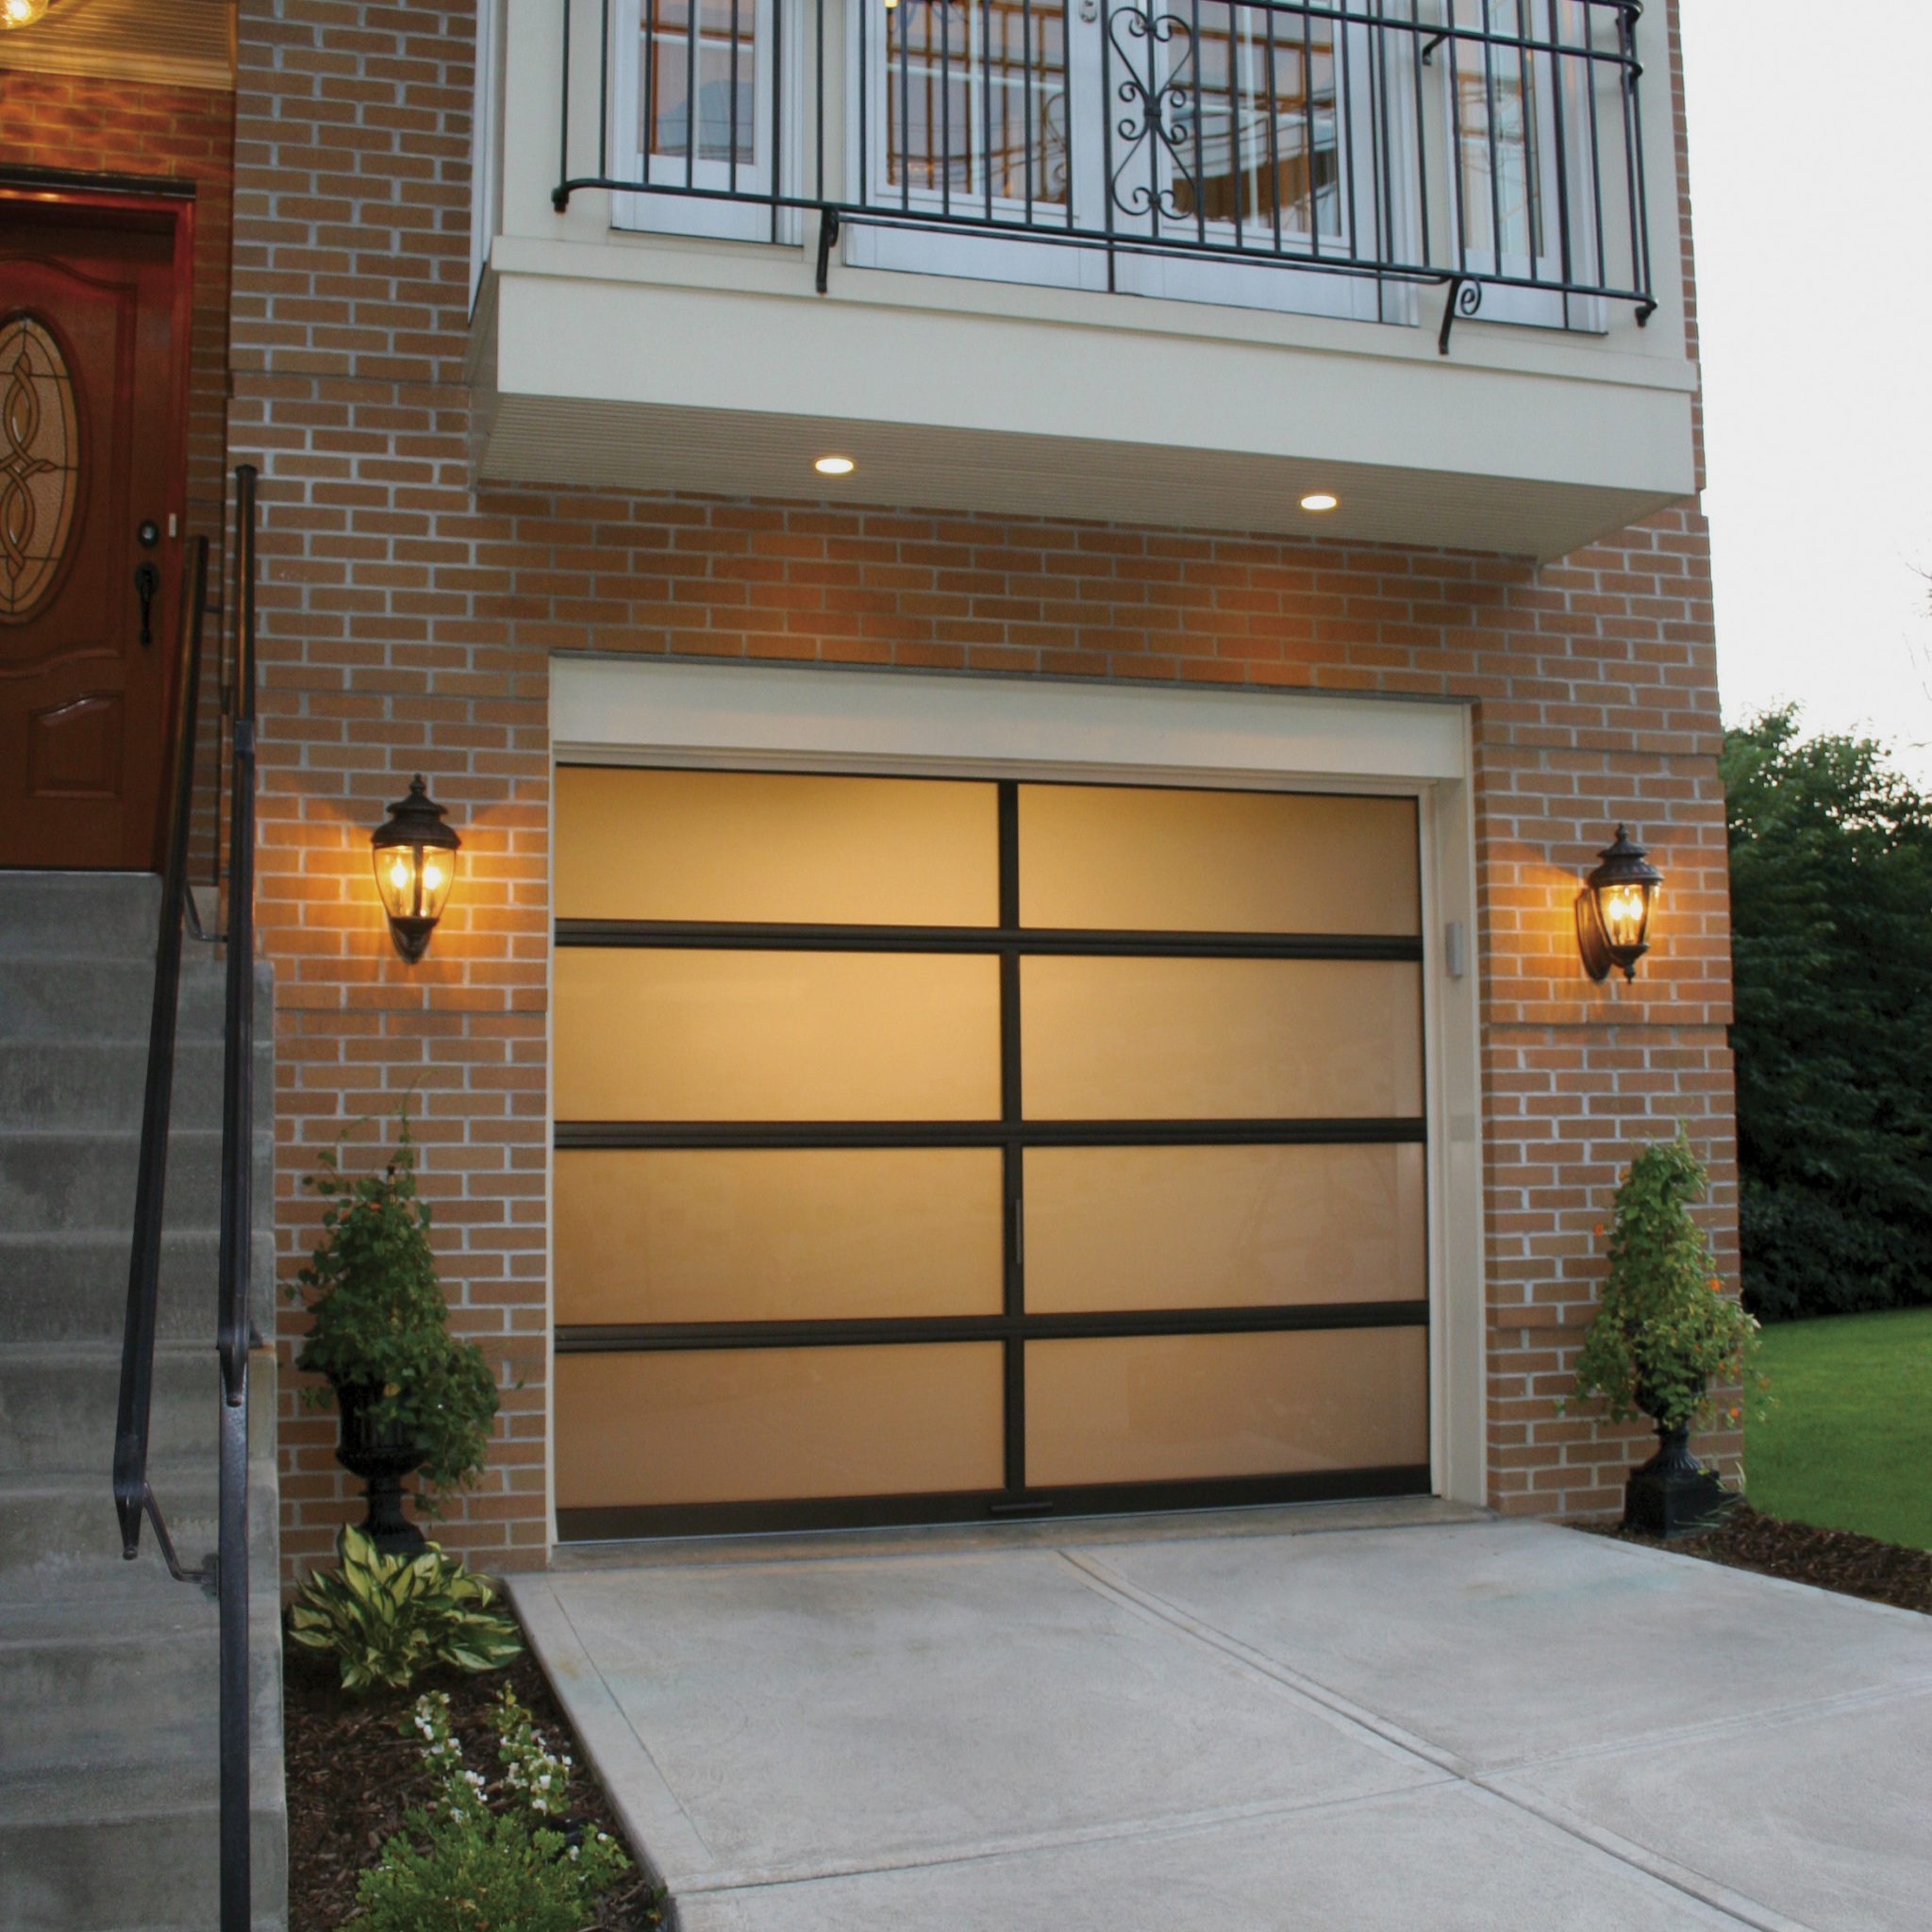 Blog Promaster Garage Door Repair Toronto Mississauga Pickering